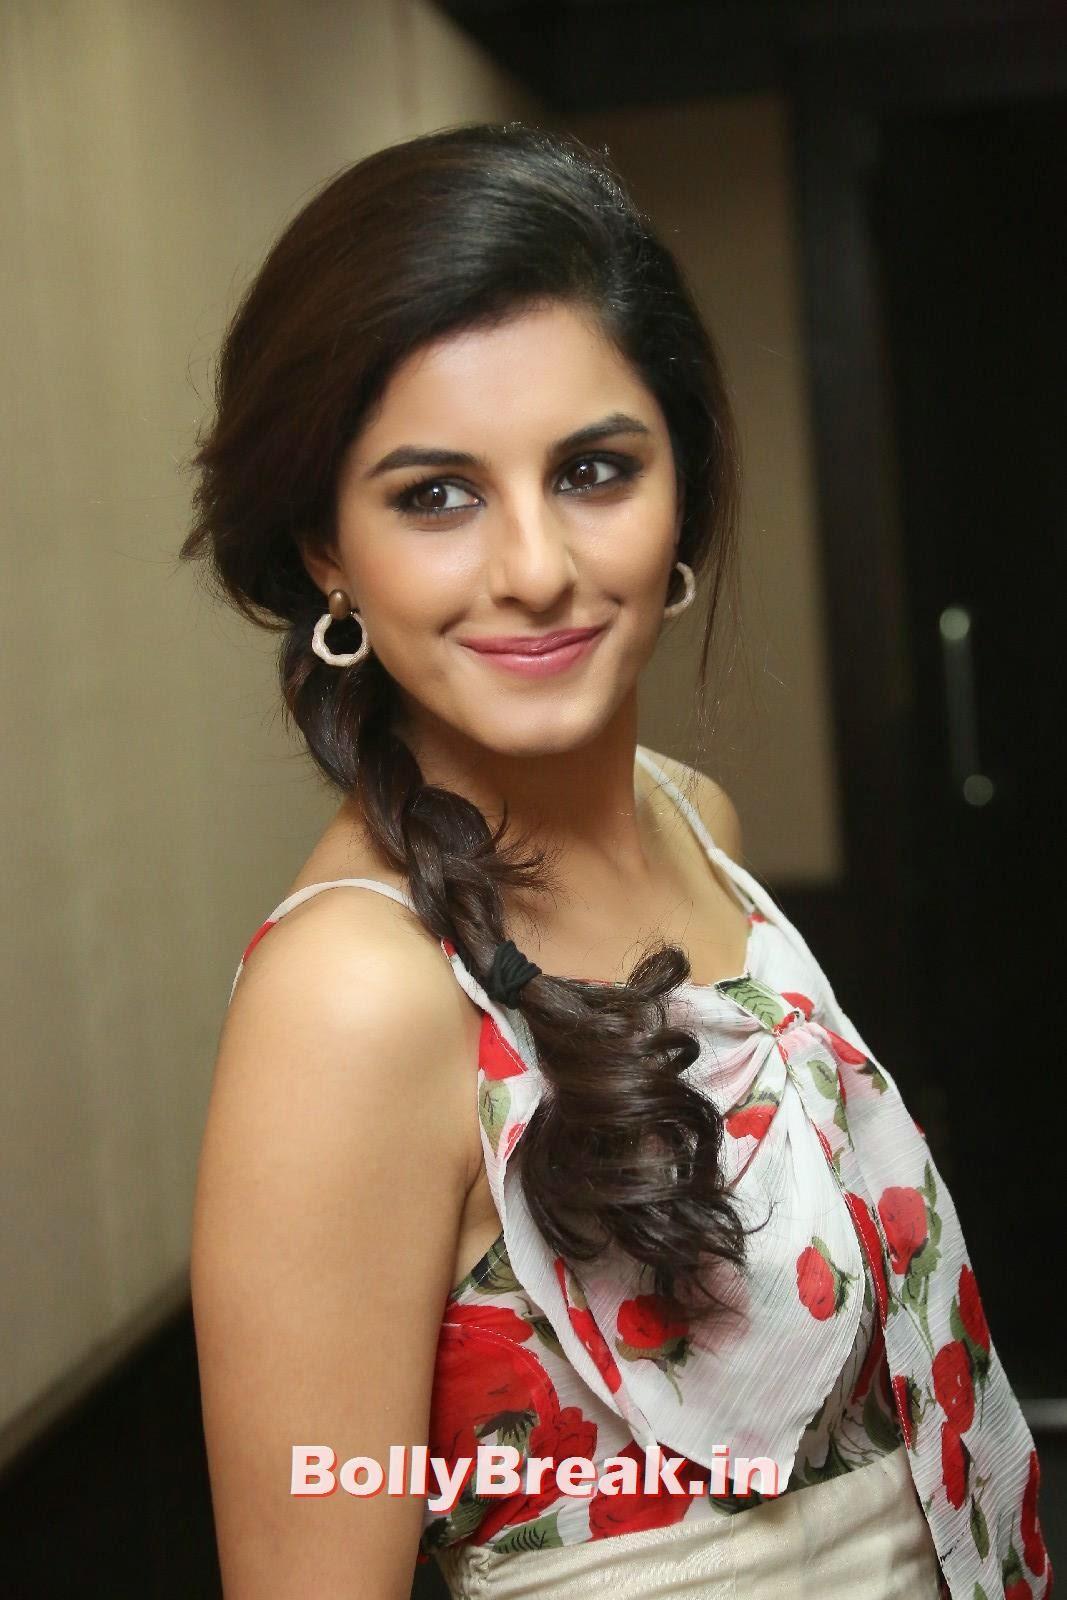 Isha Talwar (20), Isha Talwar Cute Pics - Beautiful South Actress